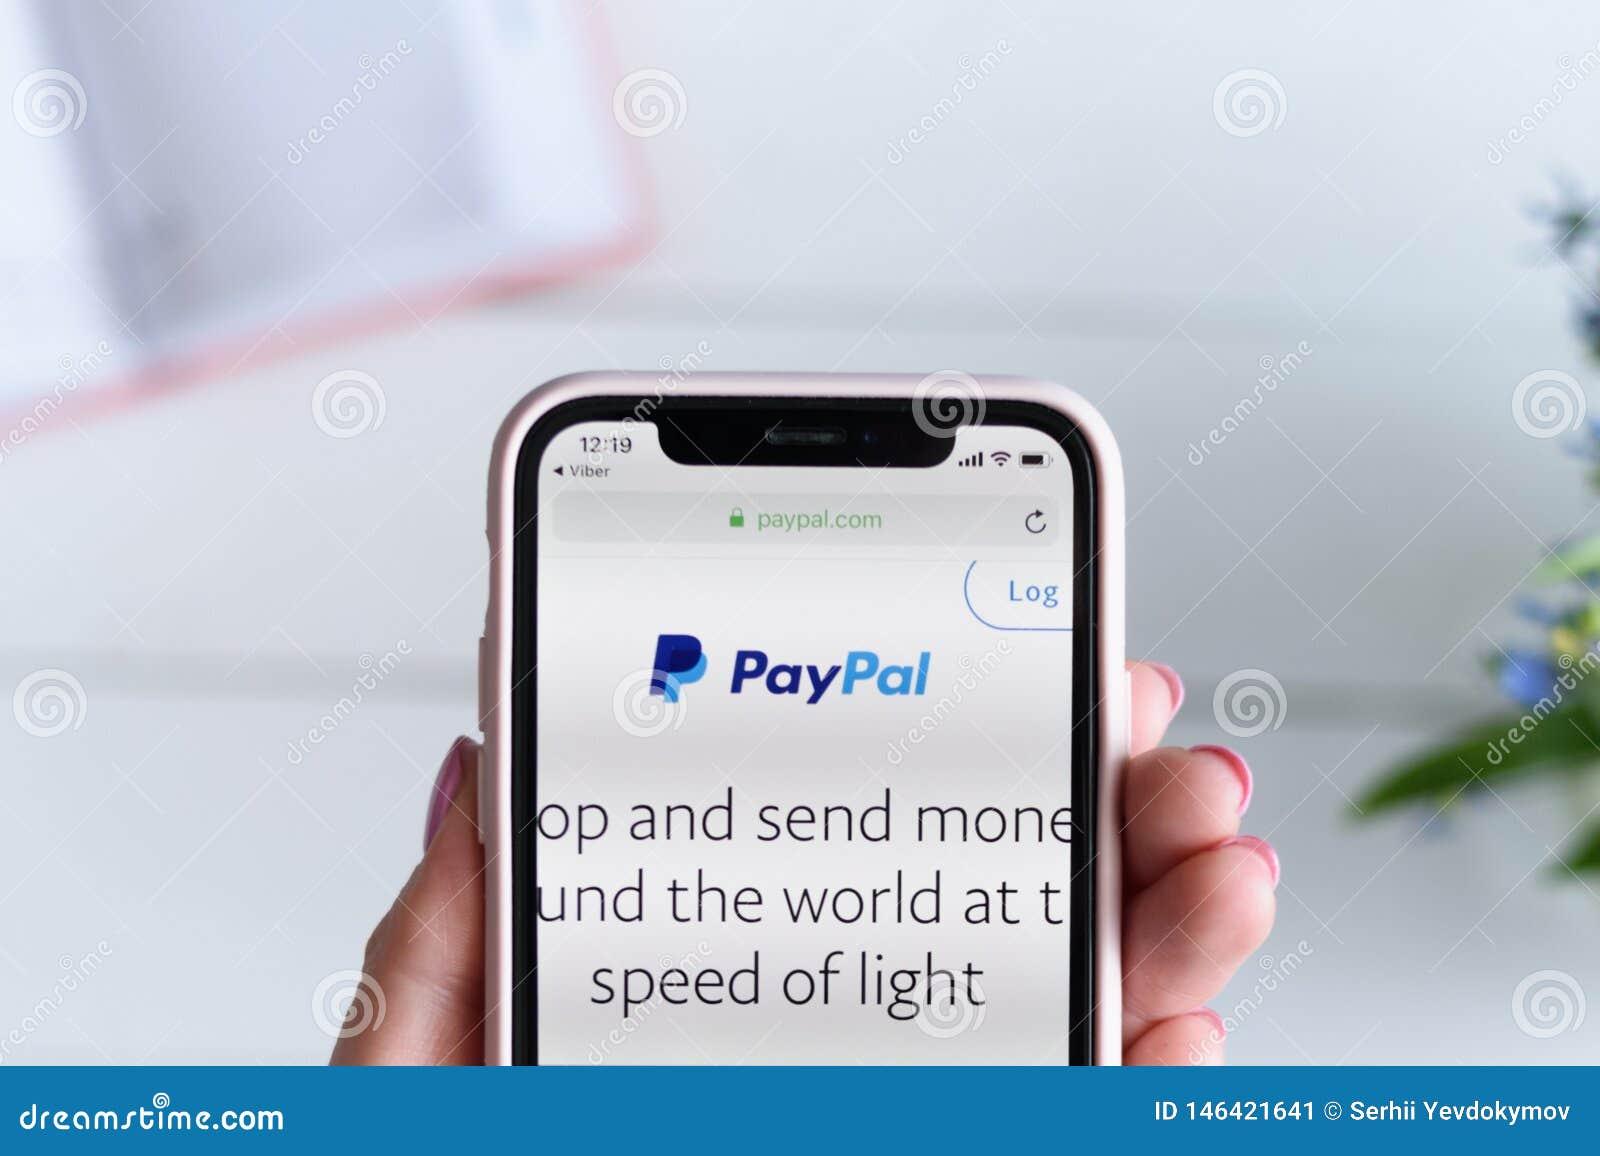 Paypal Ukraine 2019